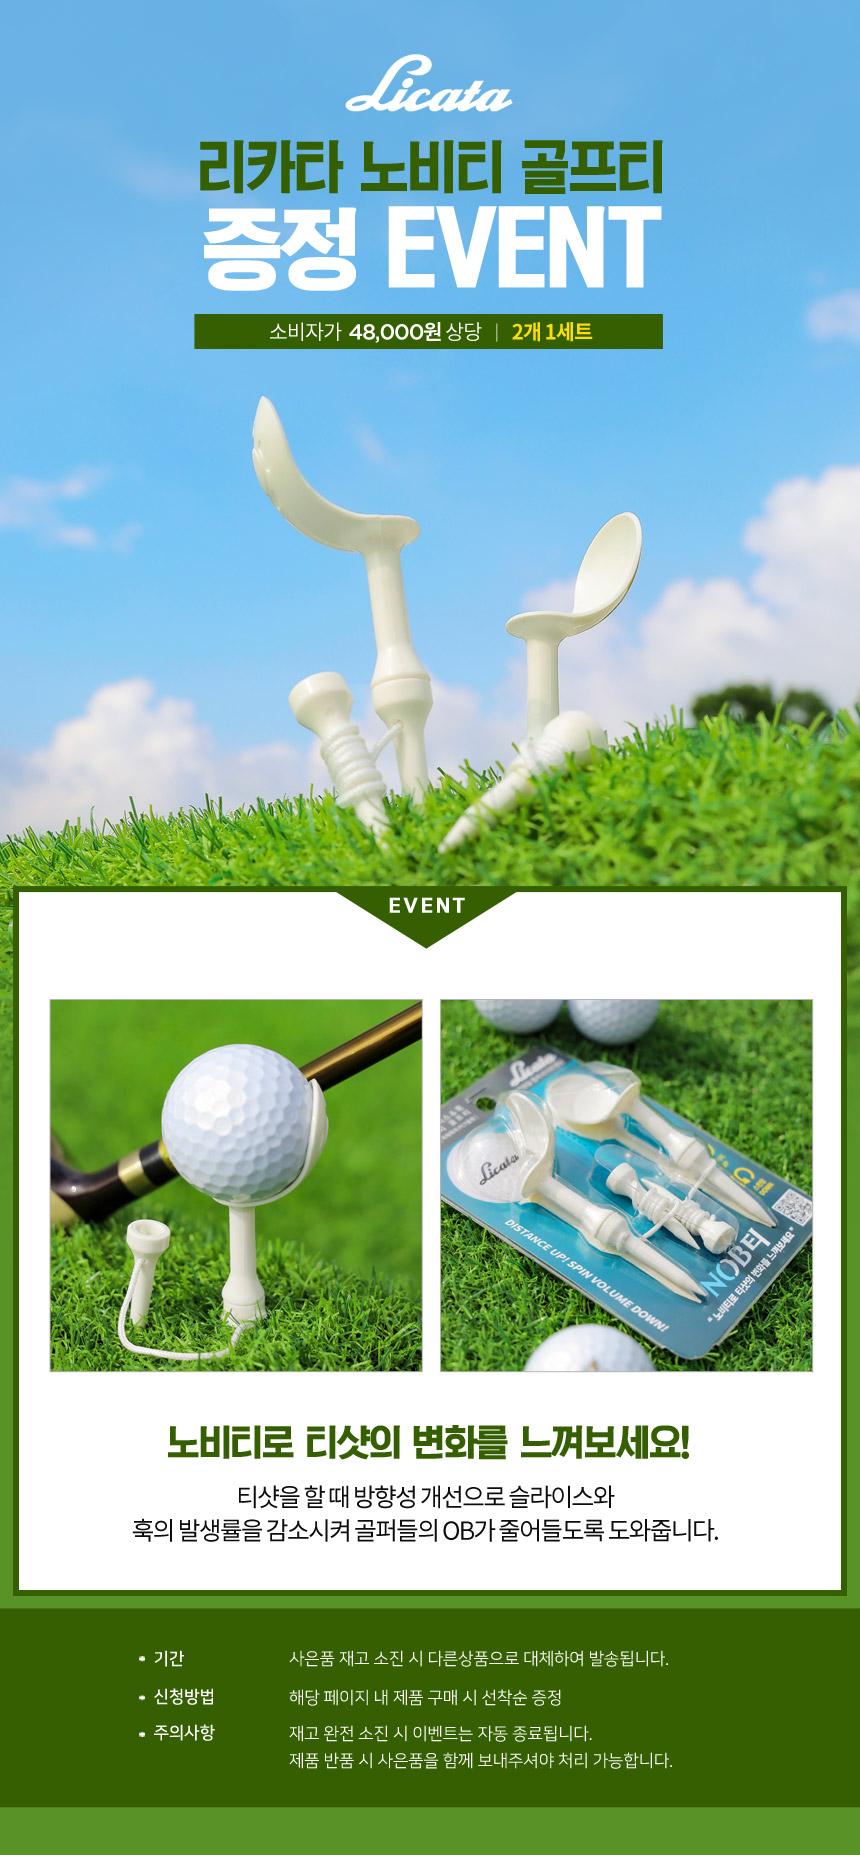 licata_multi_functional_golftee_gift_21.jpg